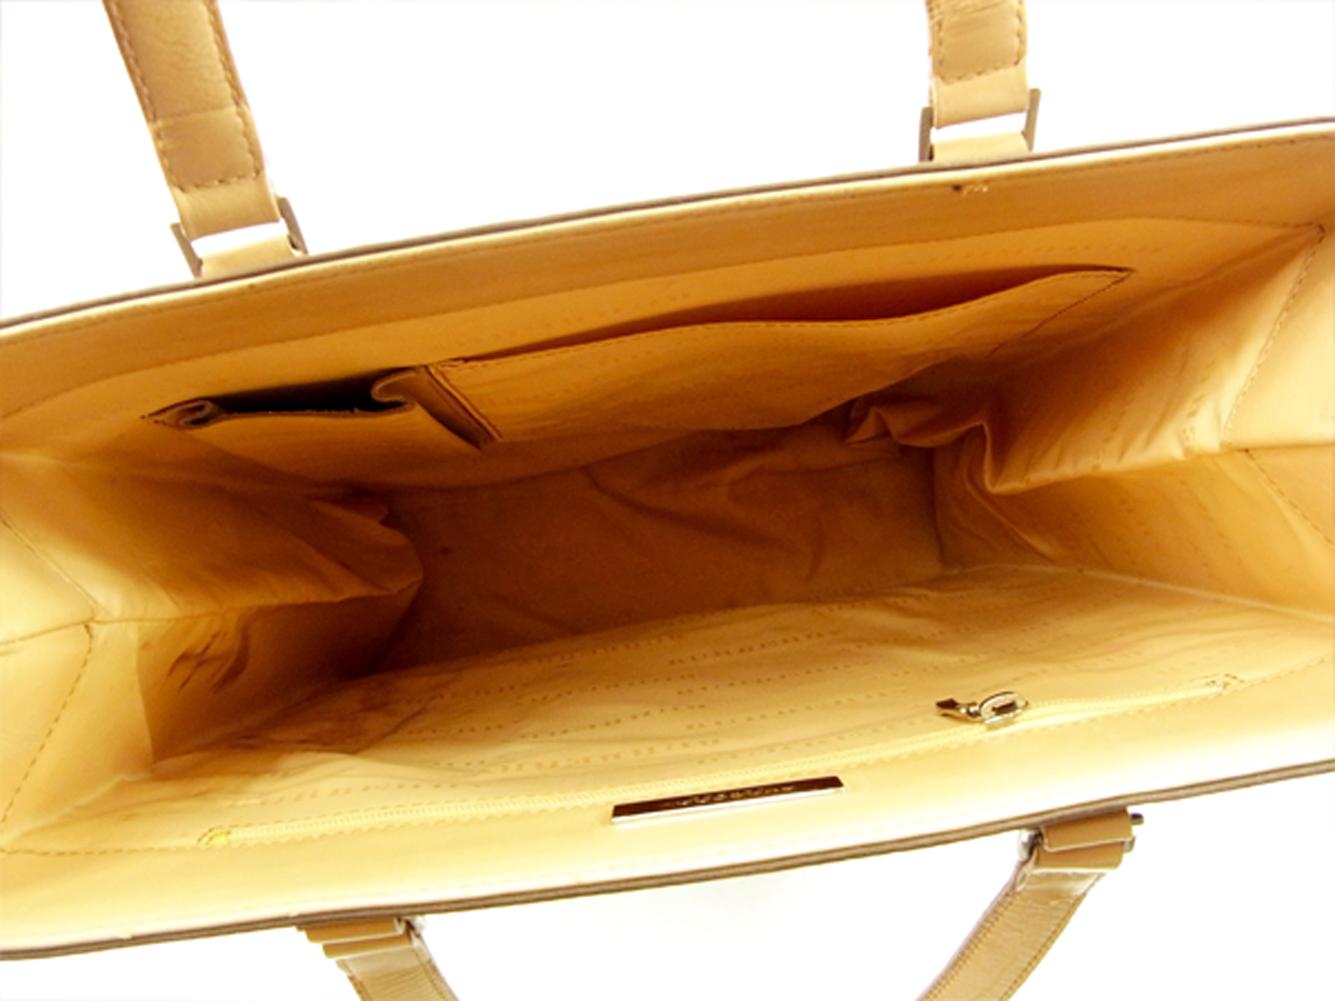 Burberry BURBERRY tote bag handbag lady s men s possible brown X beige  canvas X leather popularity sale T4688 8815d46b0240c